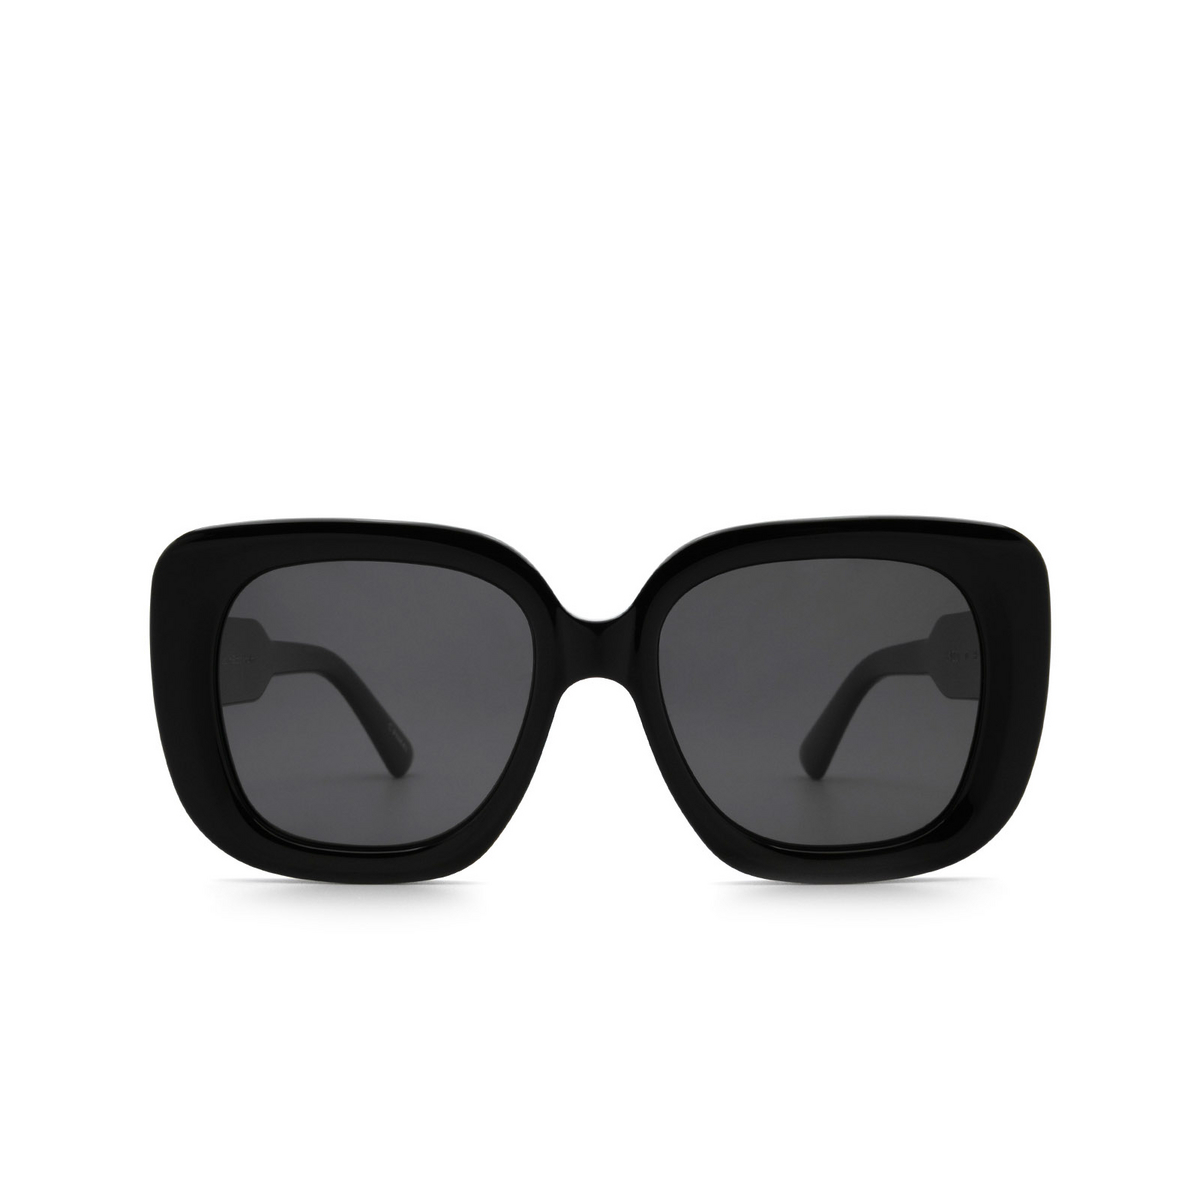 Chimi® Square Sunglasses: 10 color Black - front view.